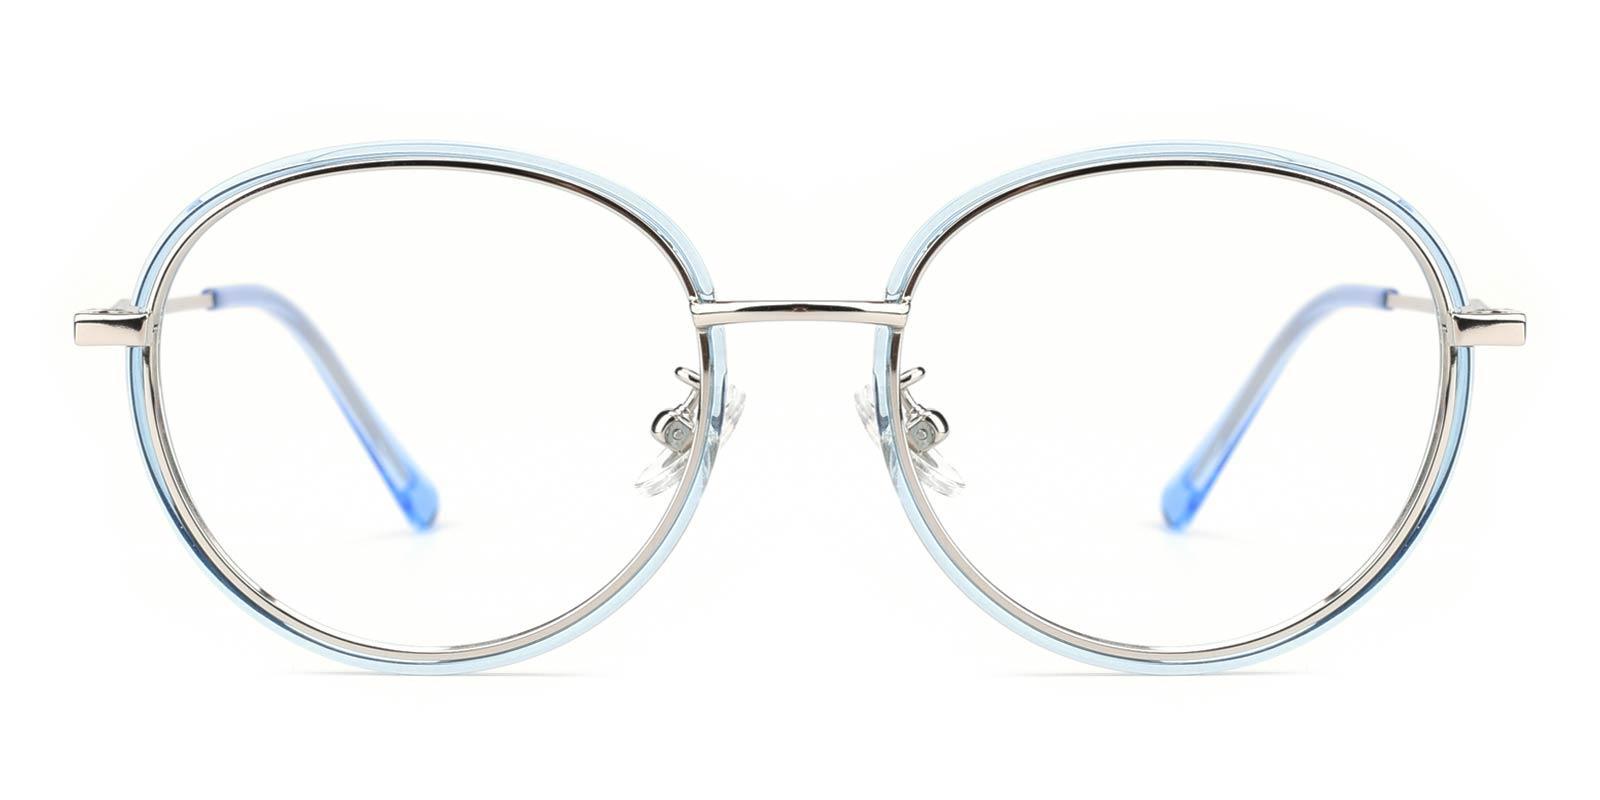 Soymilk-Blue-Round-Titanium-Eyeglasses-detail